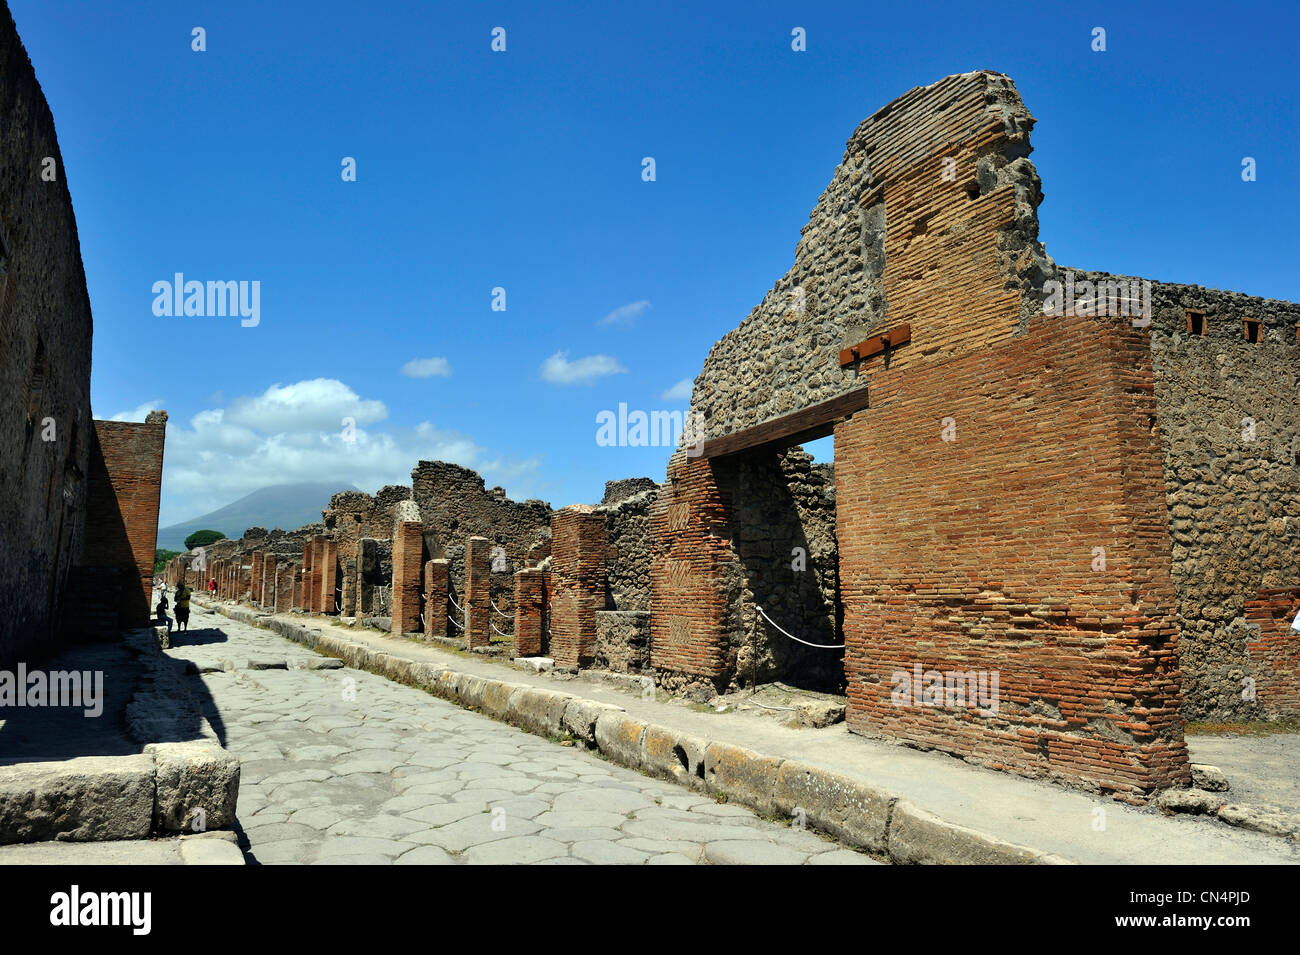 Italia, Campania, Pompei, sitio arqueológico catalogado como Patrimonio de la Humanidad por la UNESCO Foto de stock